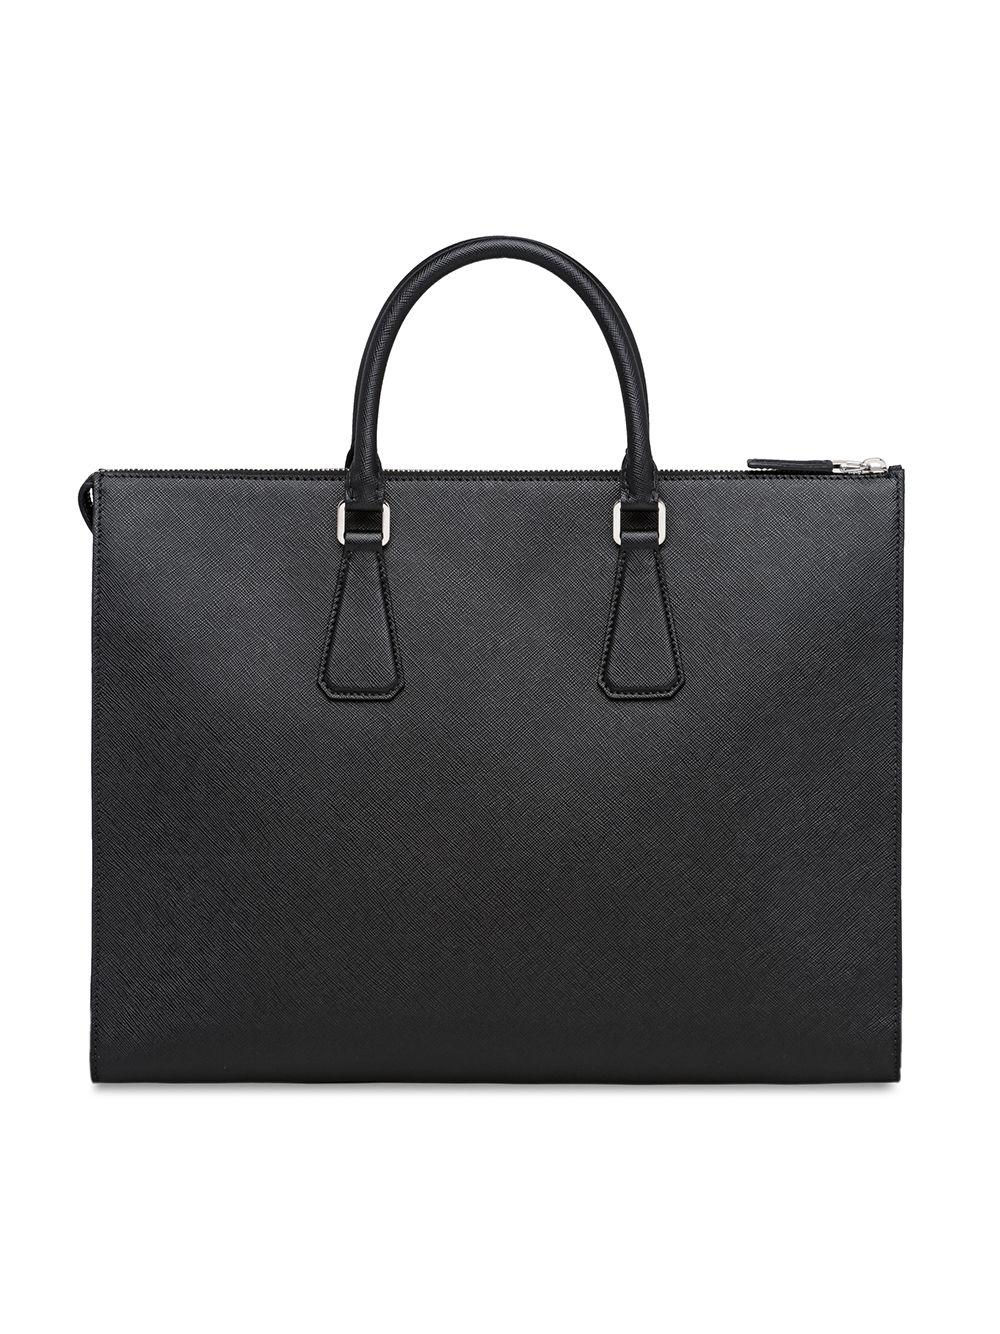 af4db5ed1c16 Prada Saffiano Leather Tote in Black for Men - Lyst